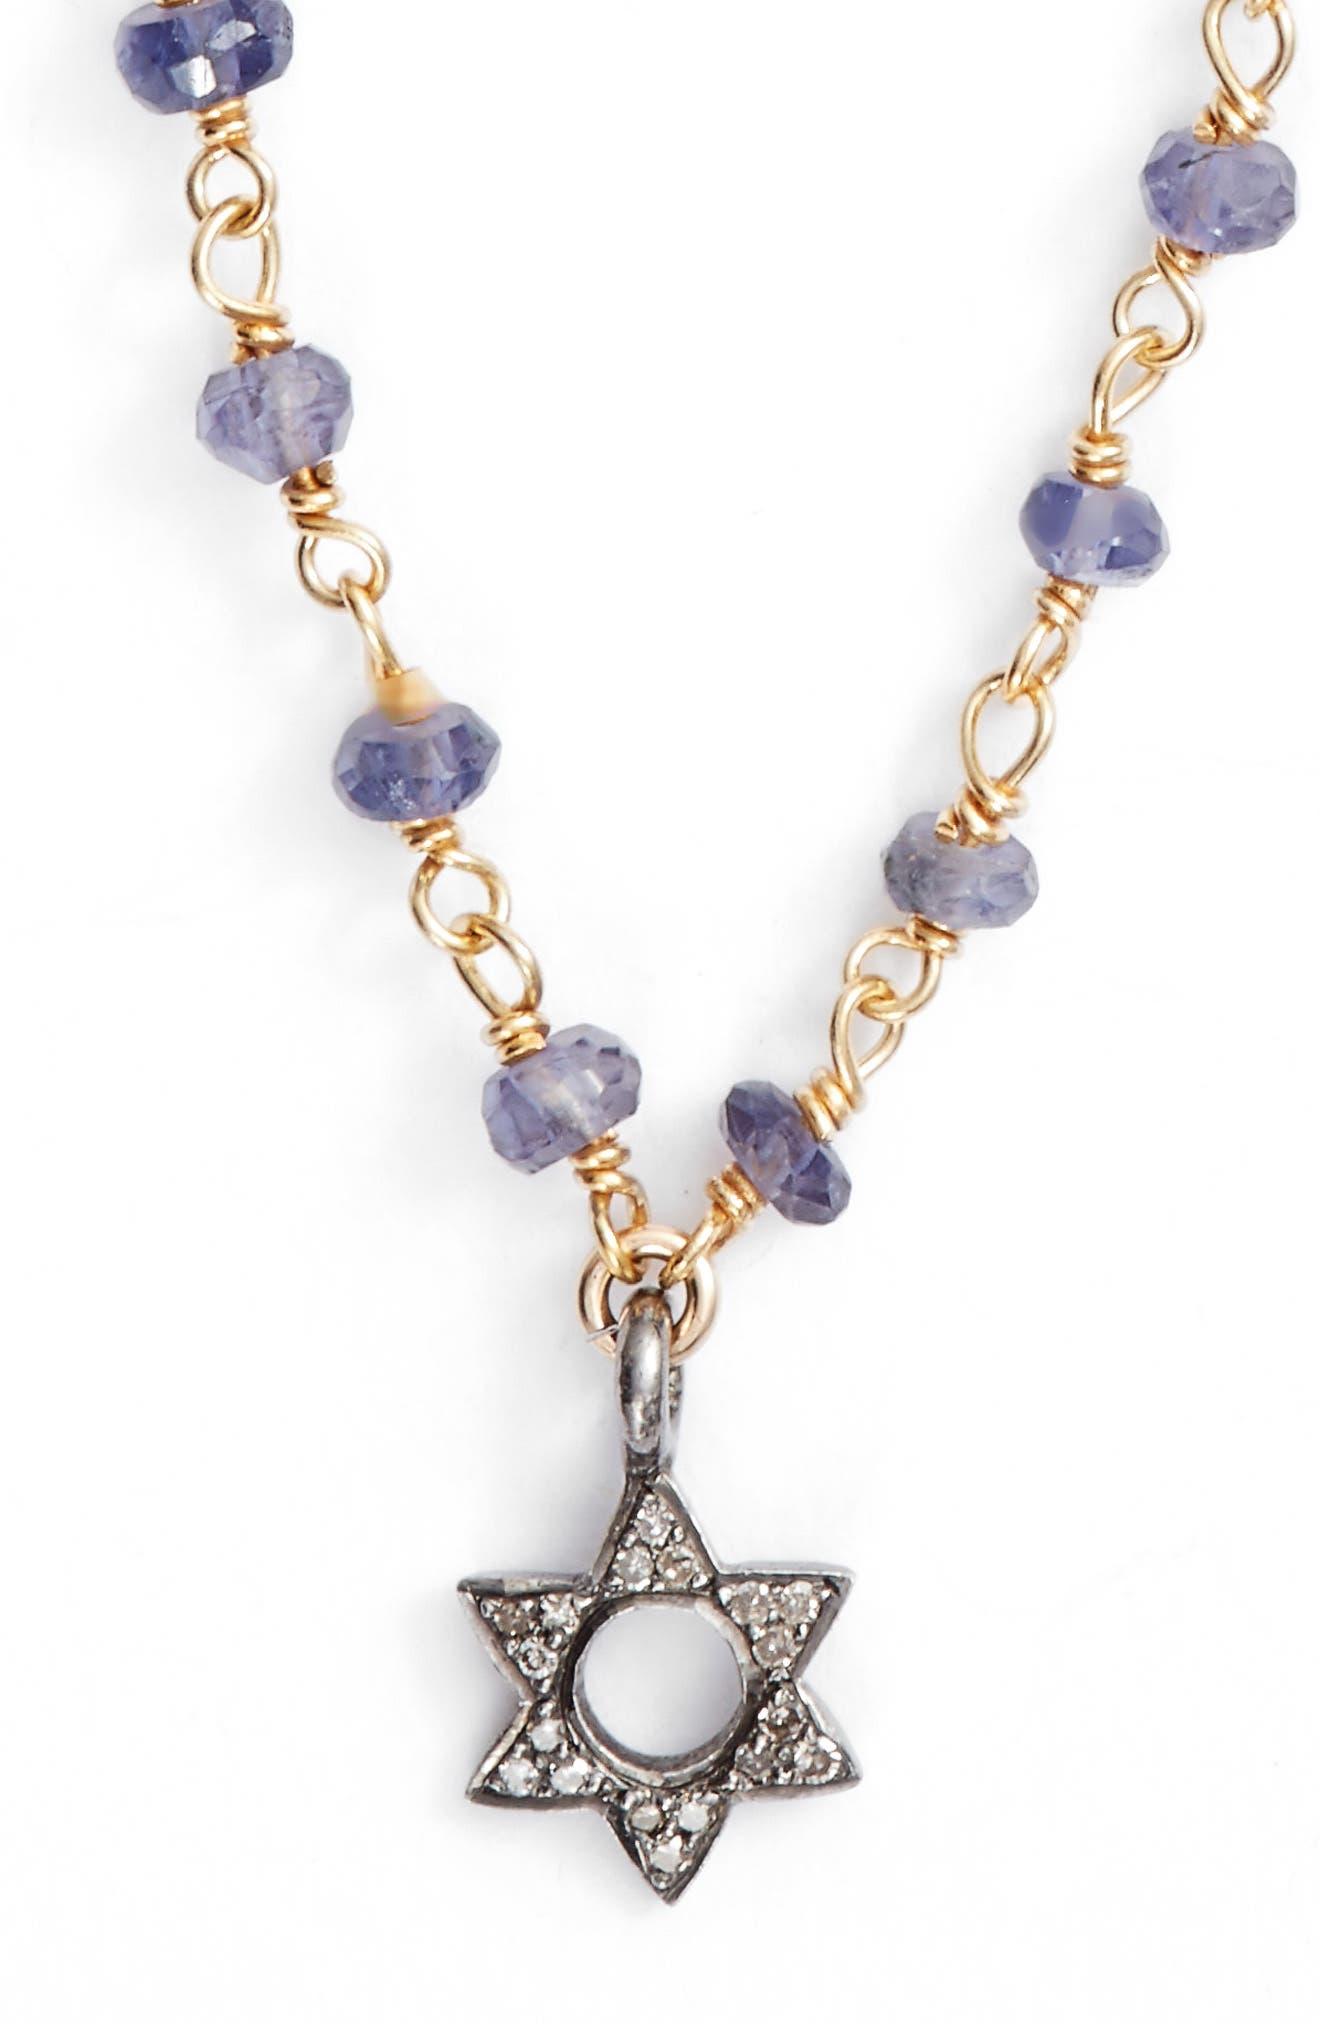 ELA RAE Phoebe Diamond Collar Necklace in Iolite